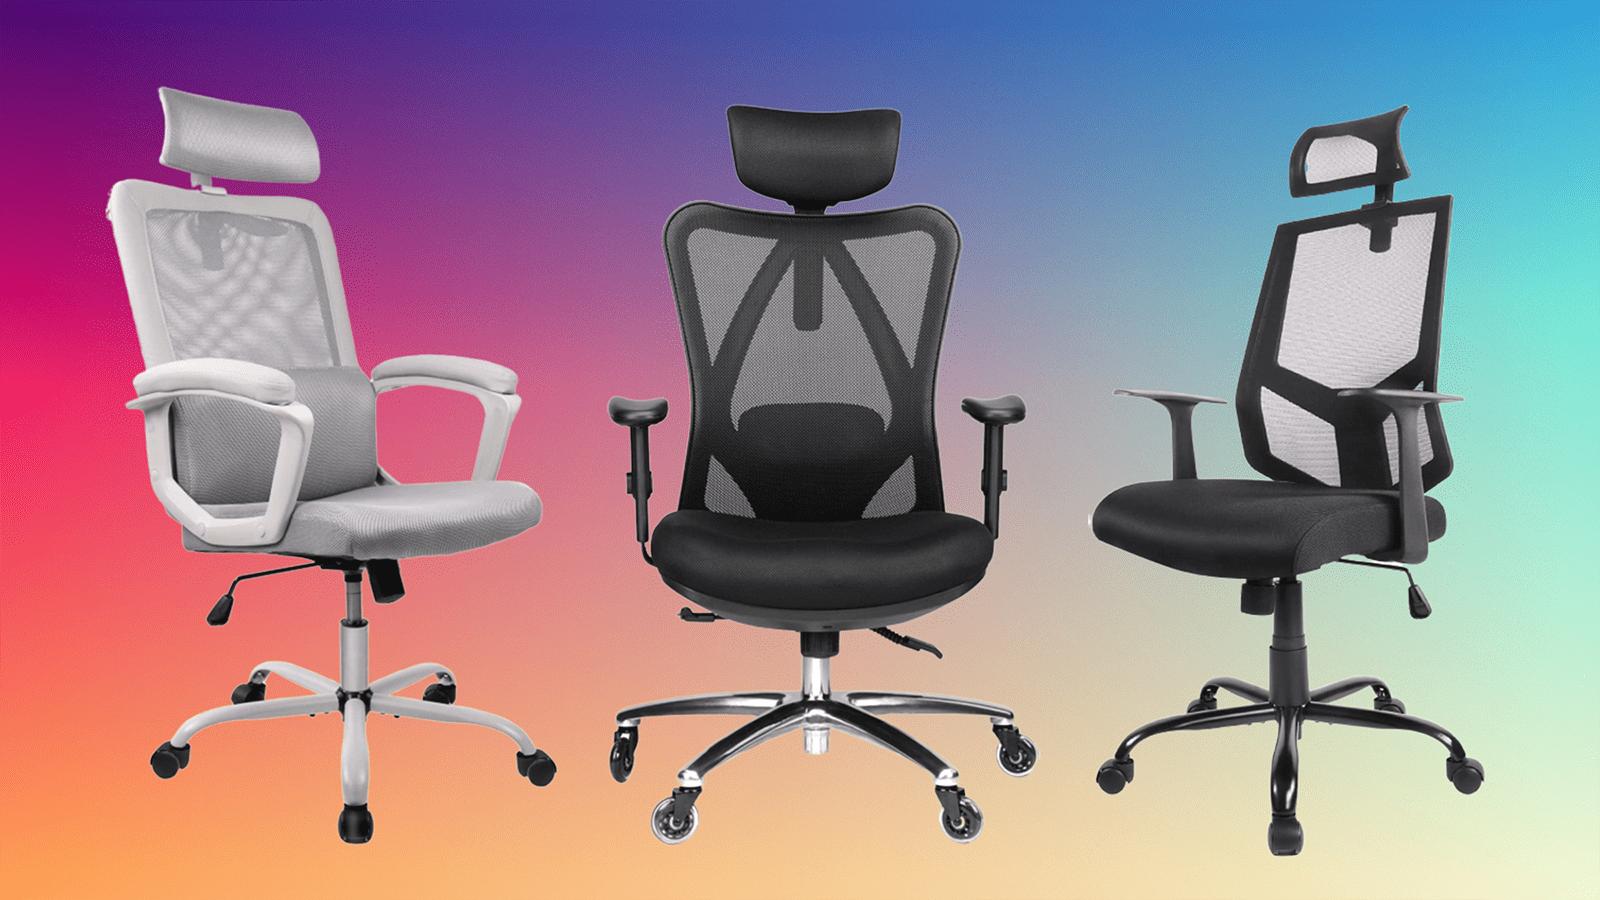 6 Best Ergonomic Office Chairs In 2020 Technadu